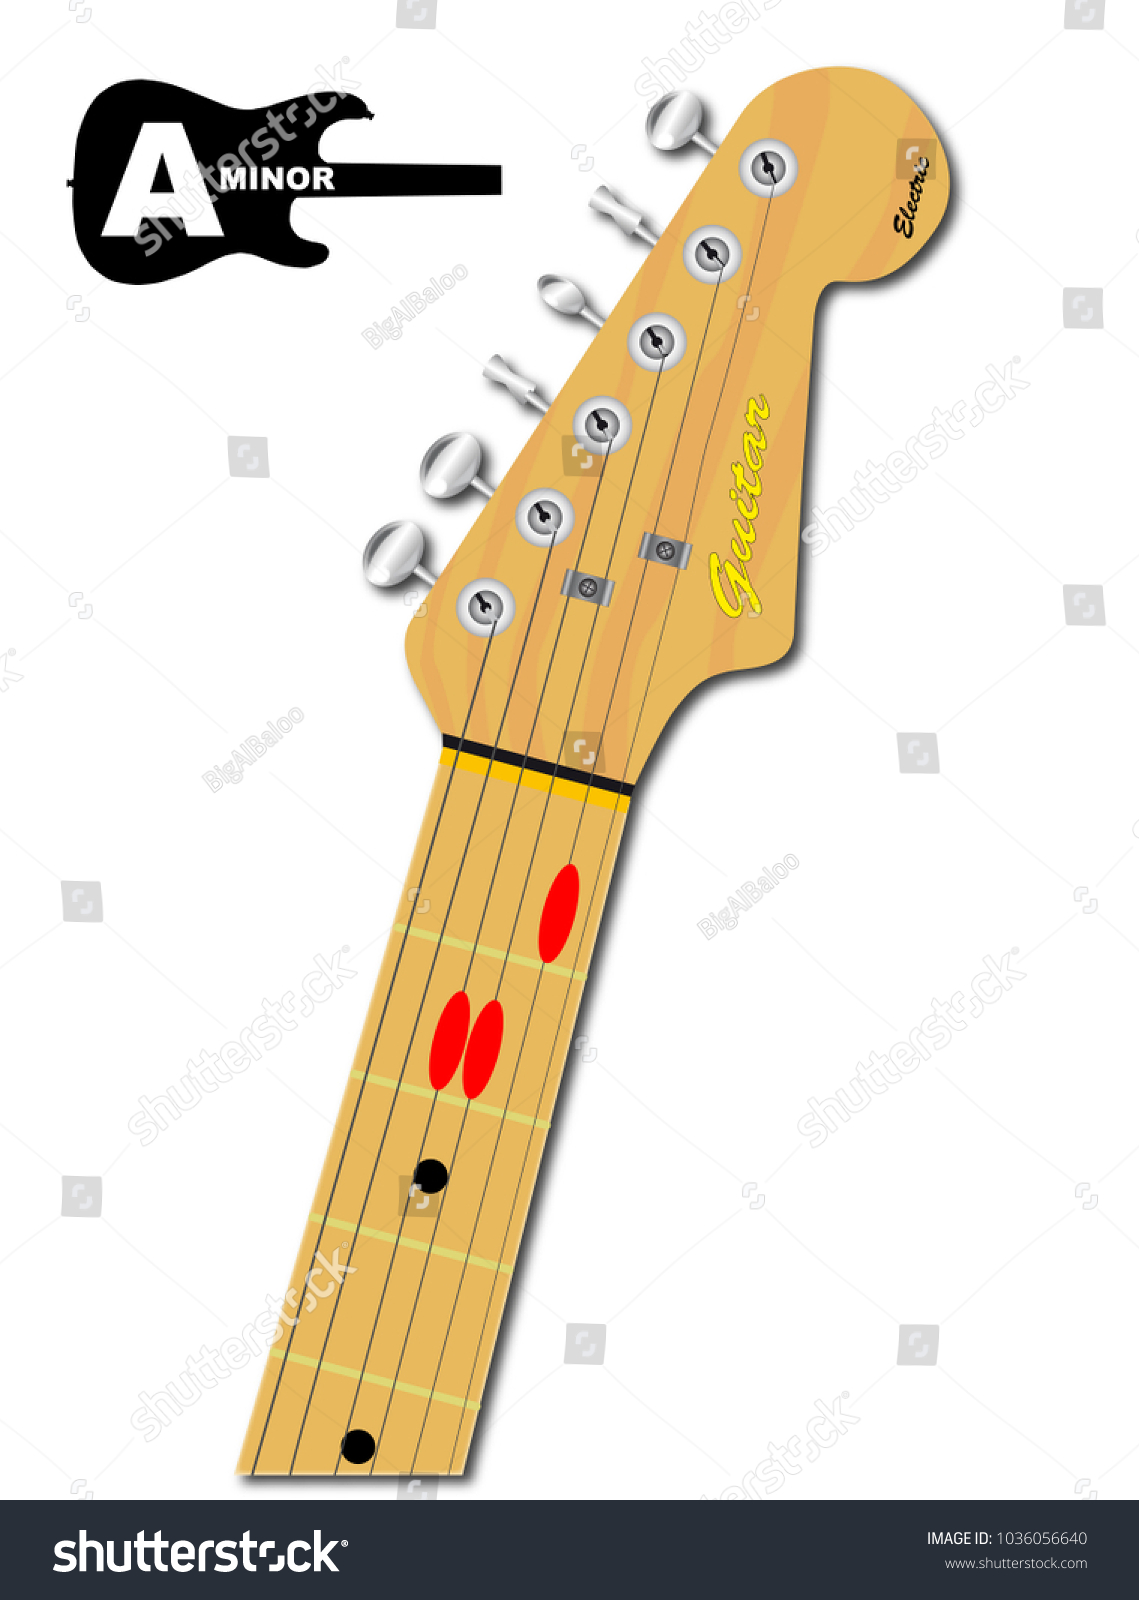 Electric Guitar Neck Chord Shape Minor Stock Illustration 1036056640